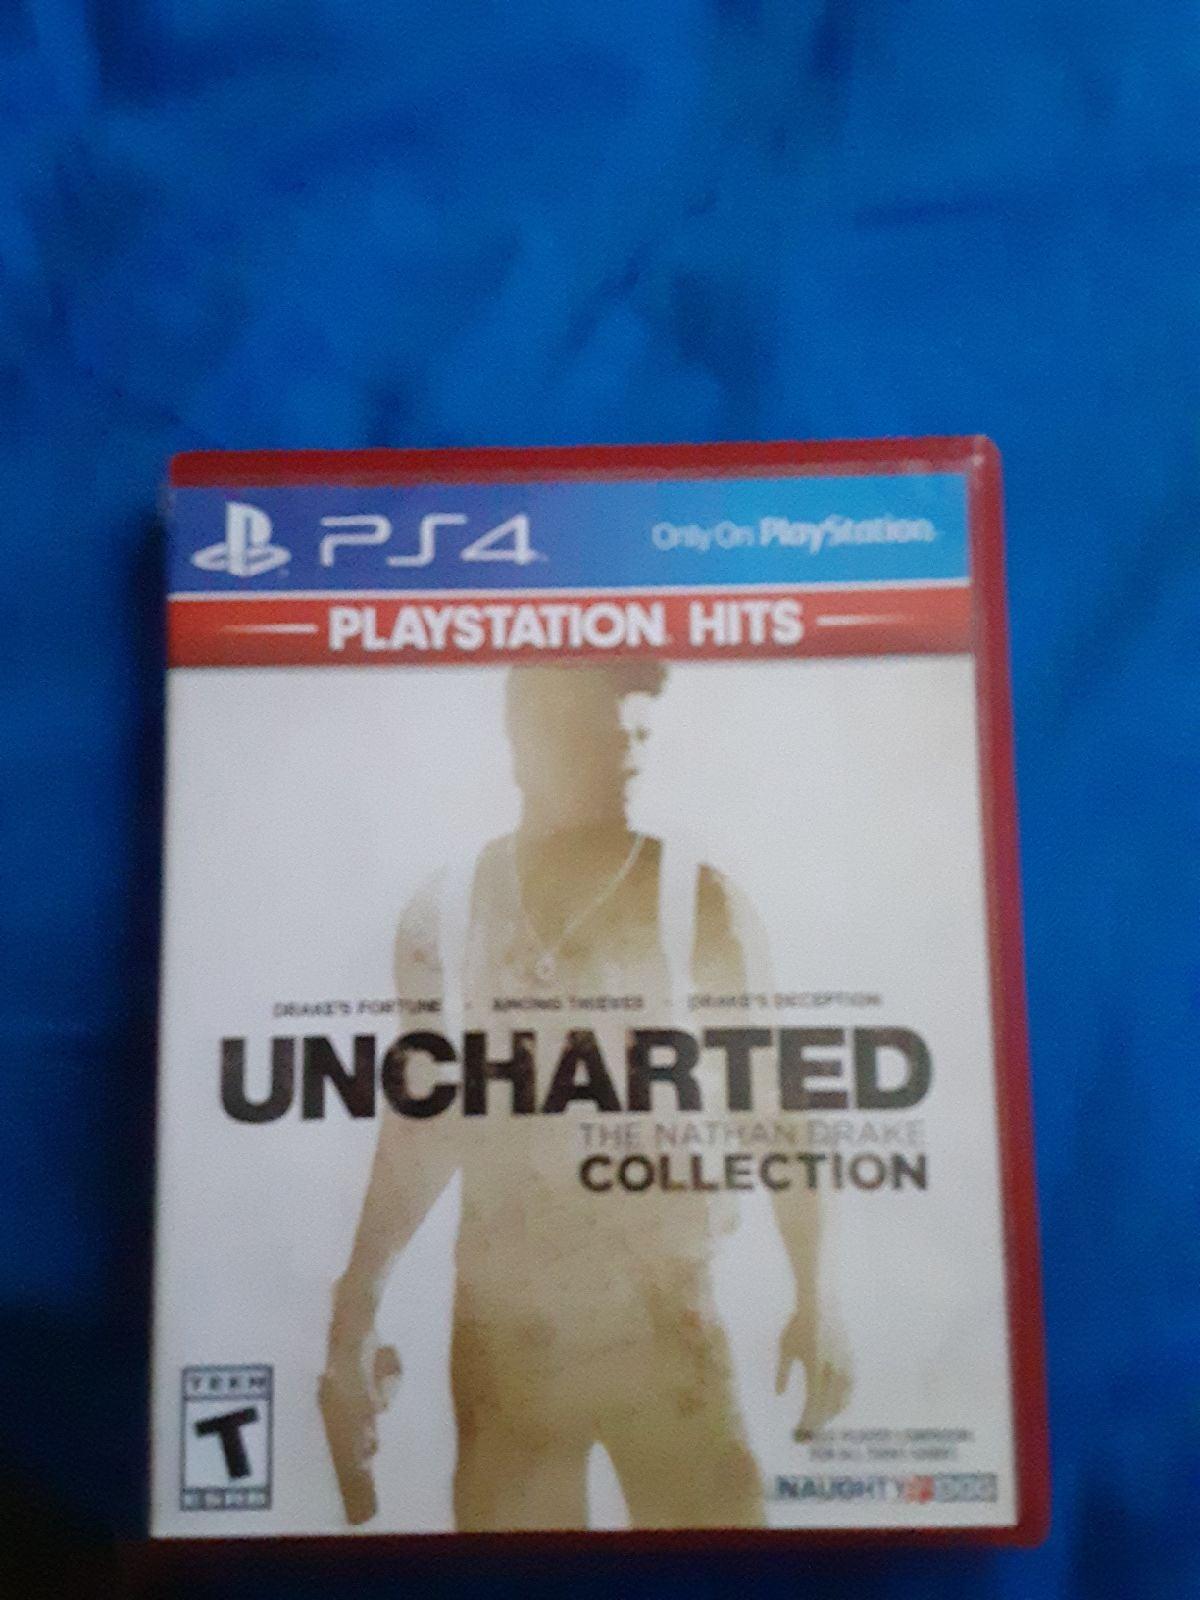 Uncharted 1 2 and 3 game bundle